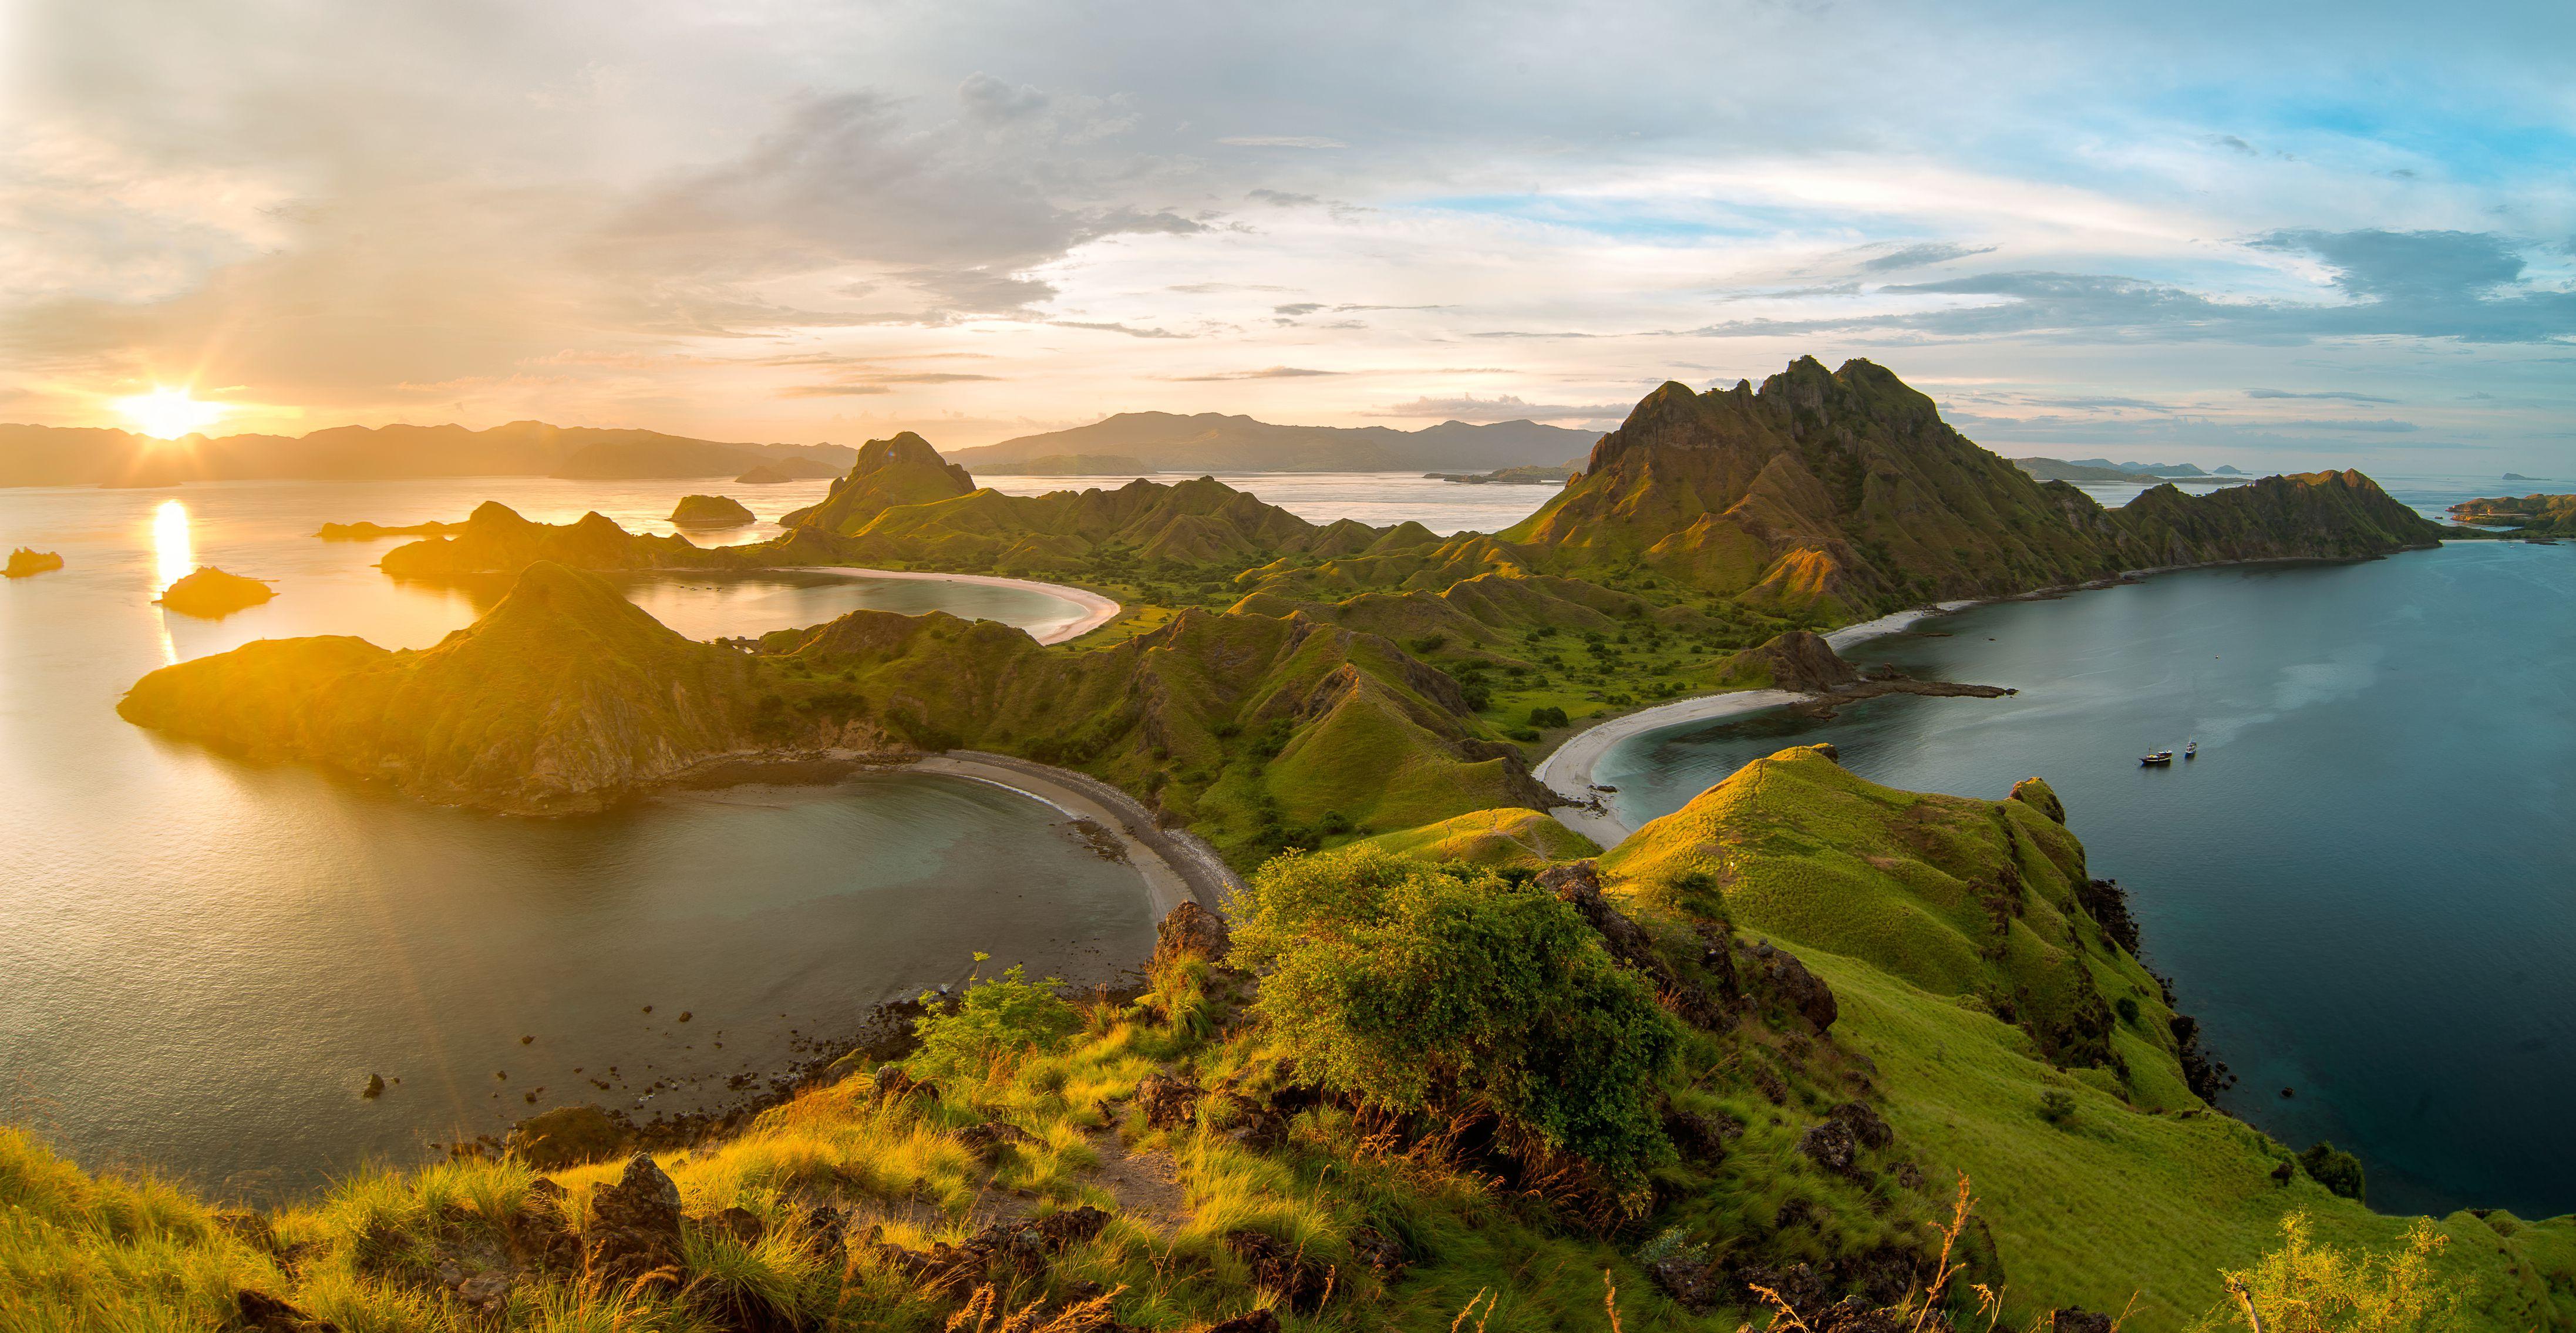 Sunset over Padar Island, Indonesia